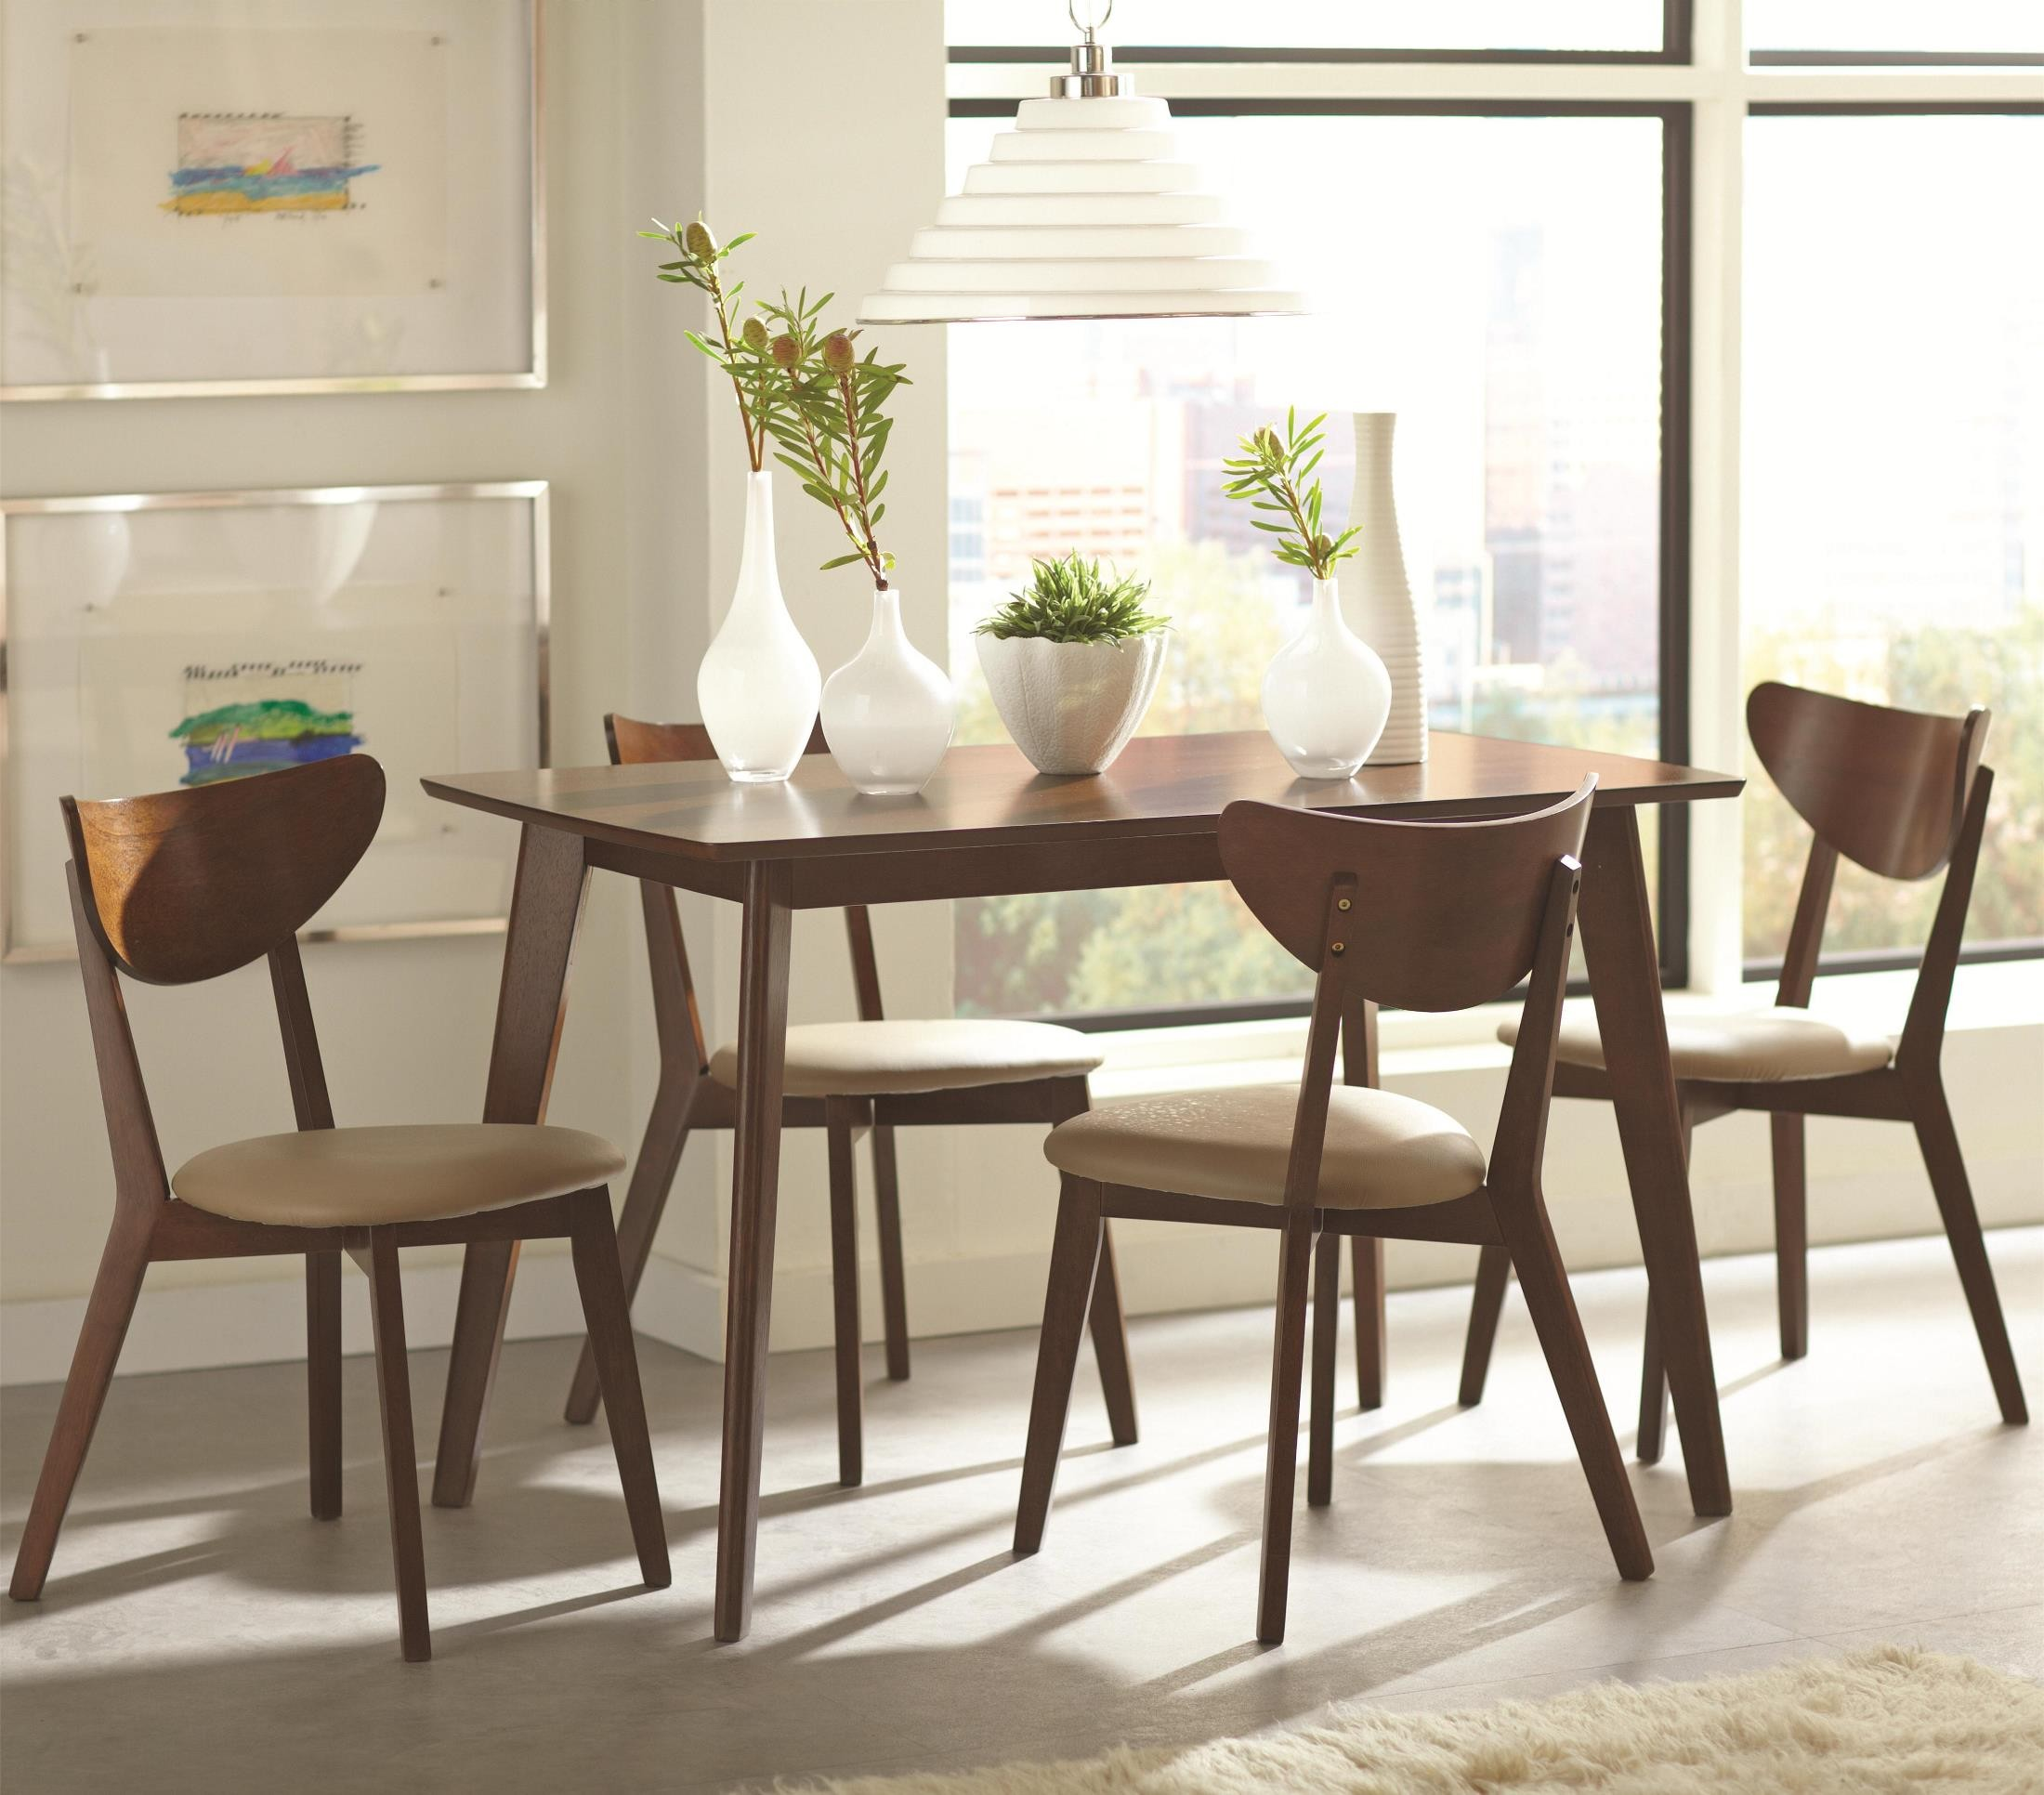 Dining Room Set For 12: Coaster Kersey Dining Room Set